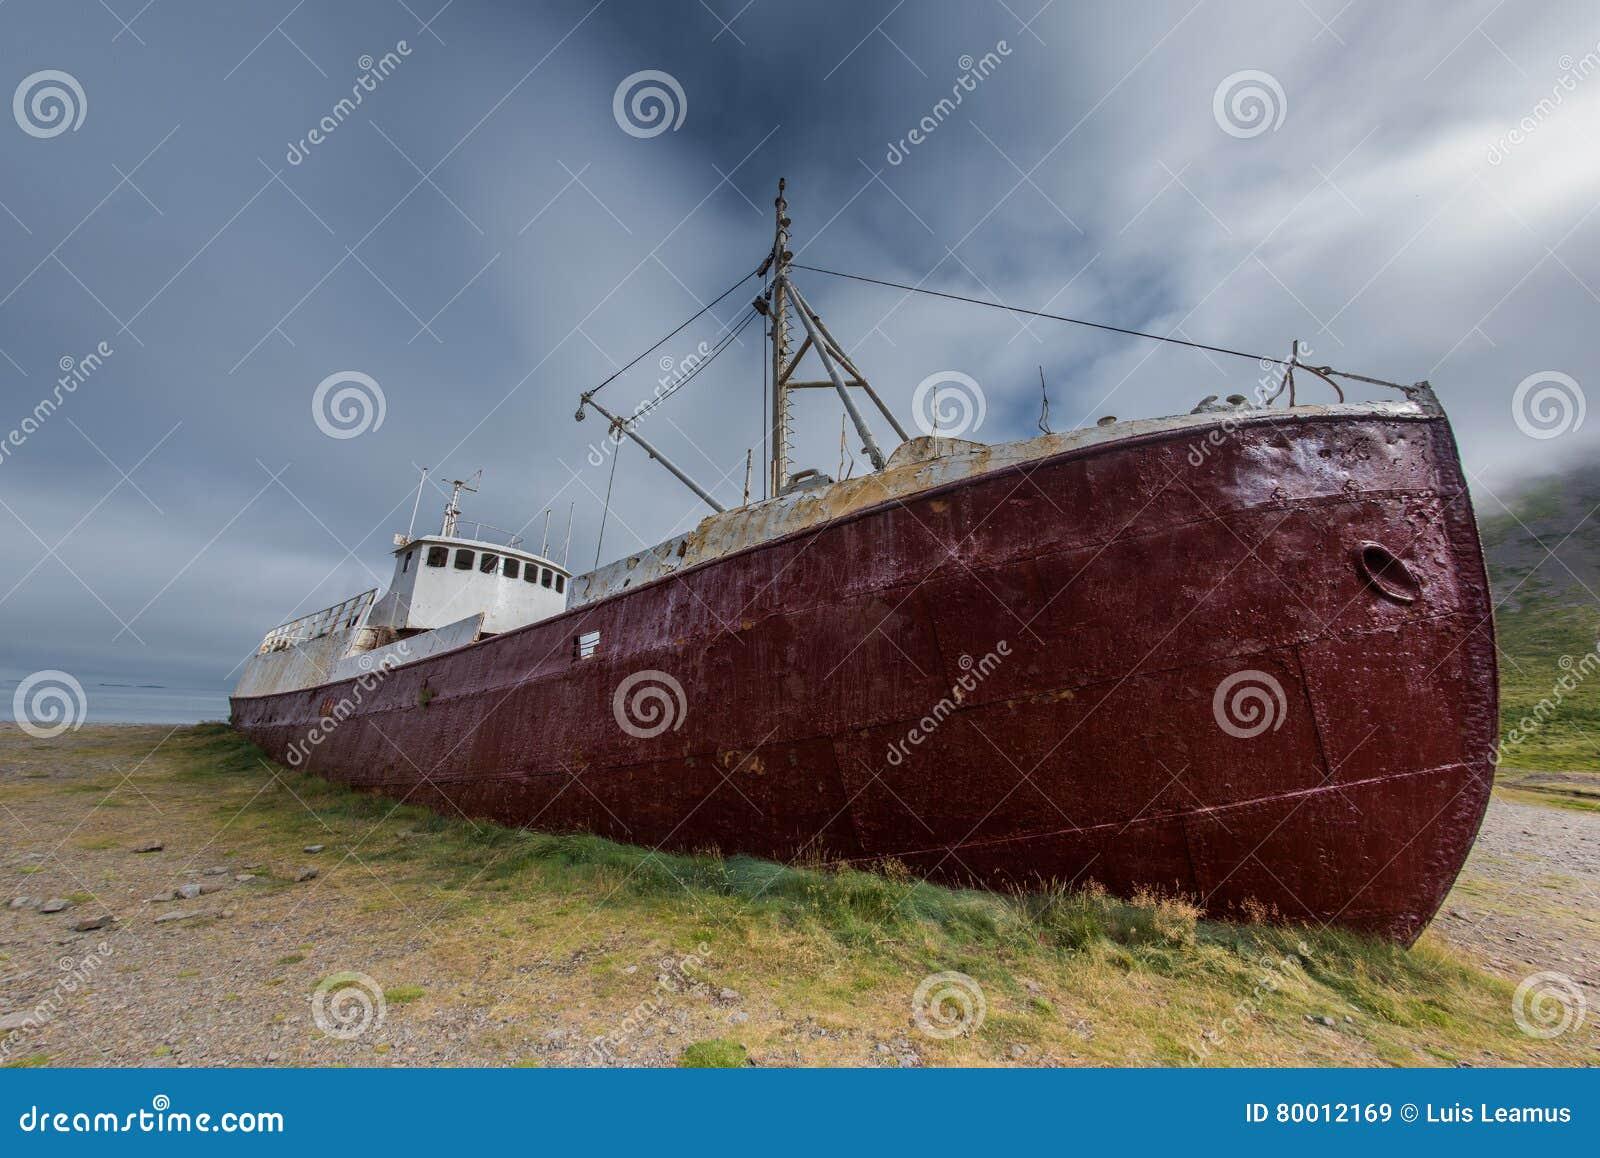 Ship Wreck, Western Fjords, Iceland Stock Image - Image of icelandic